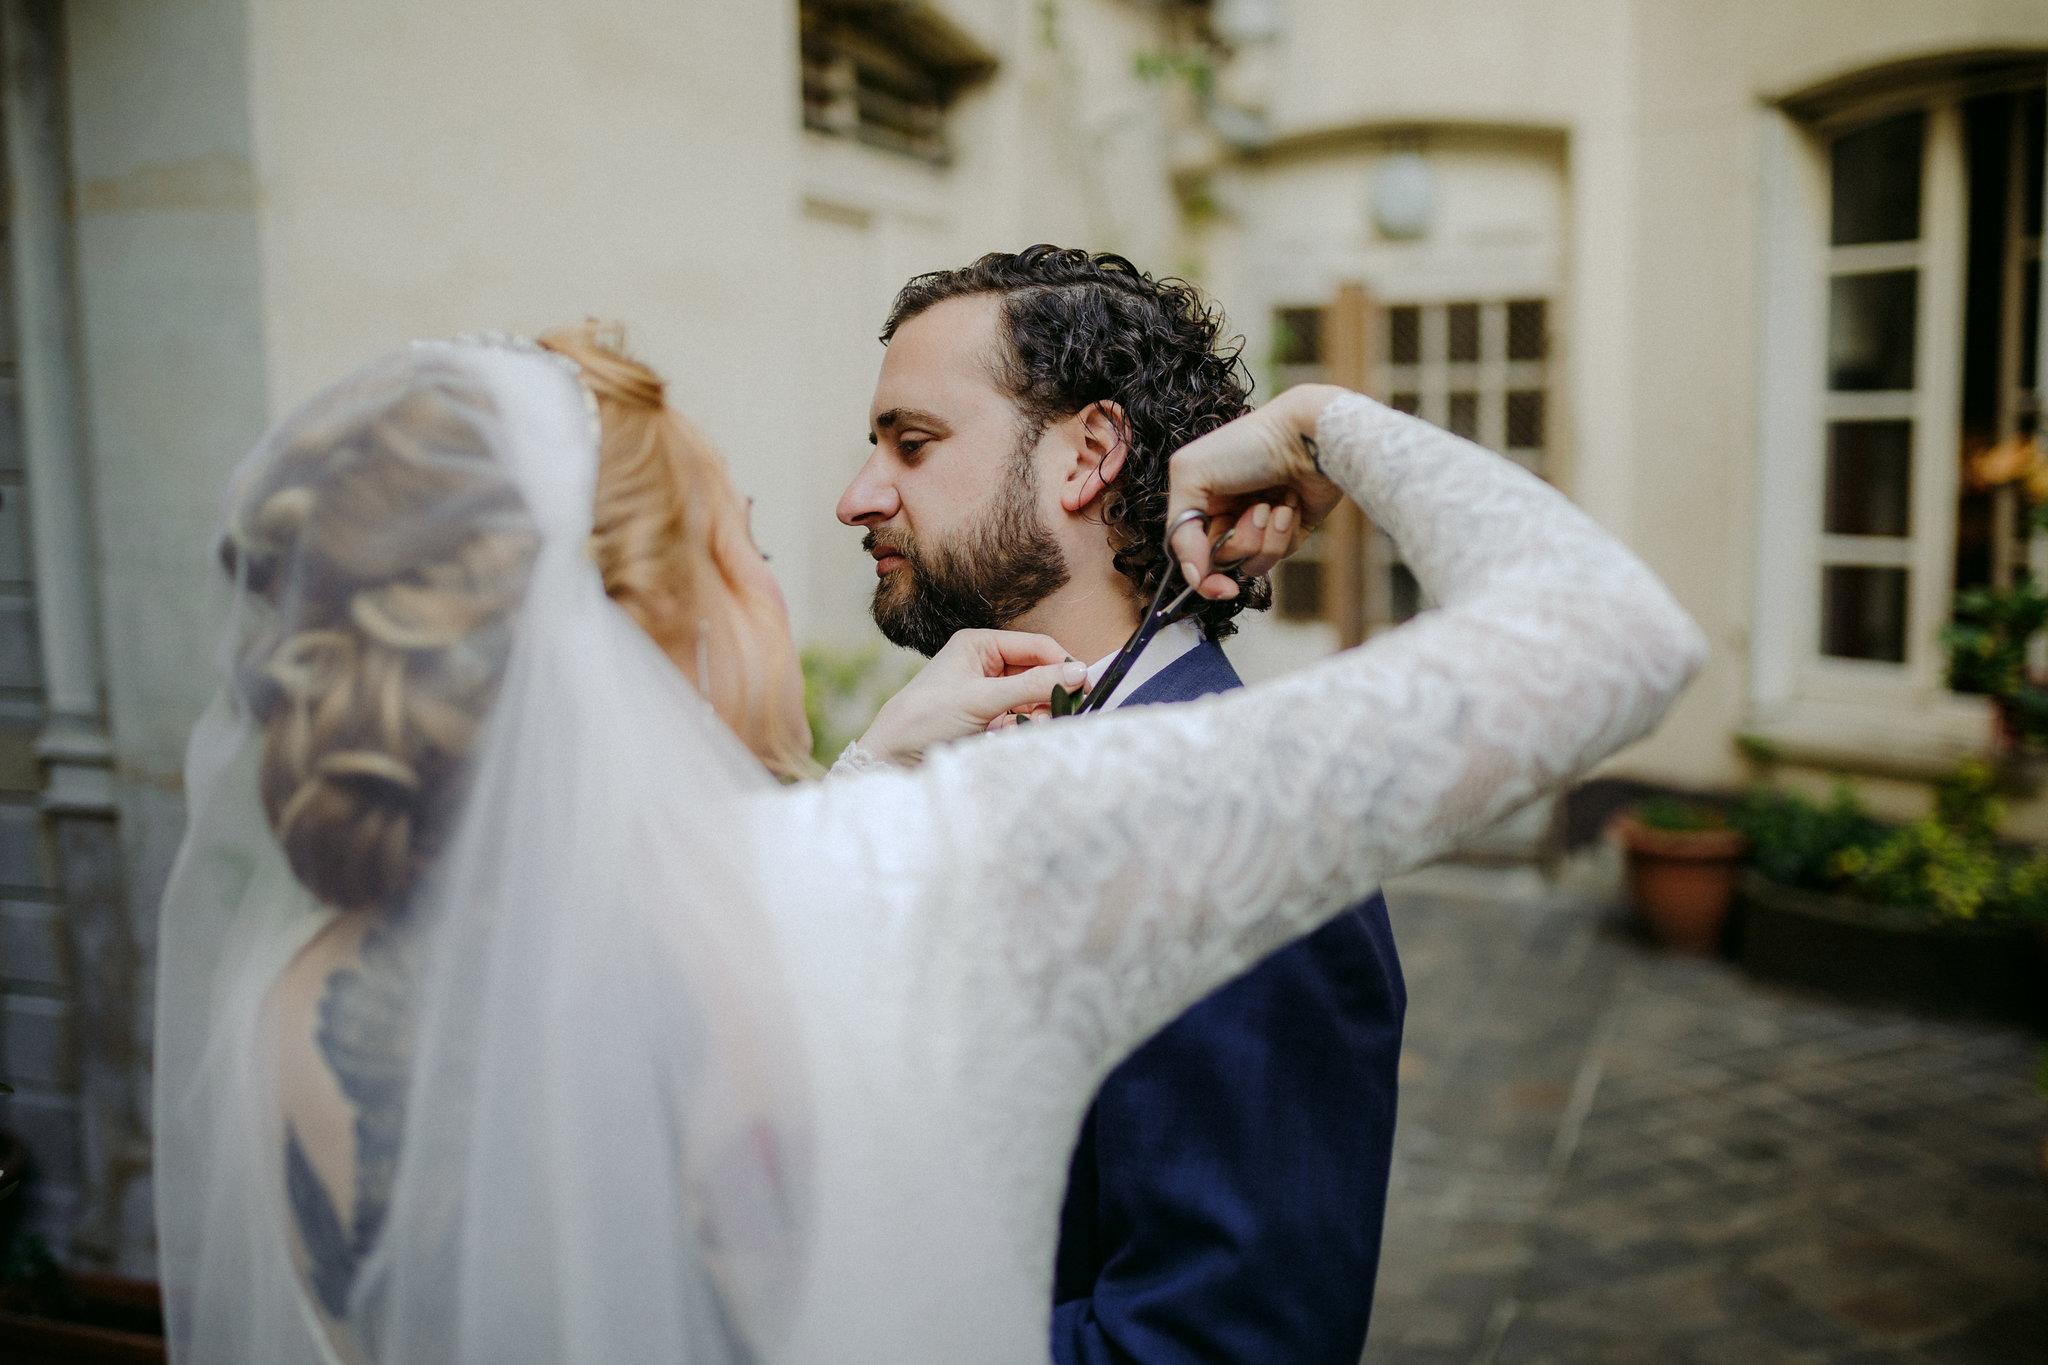 Paris_elopement_wedding_photographer-105.jpg